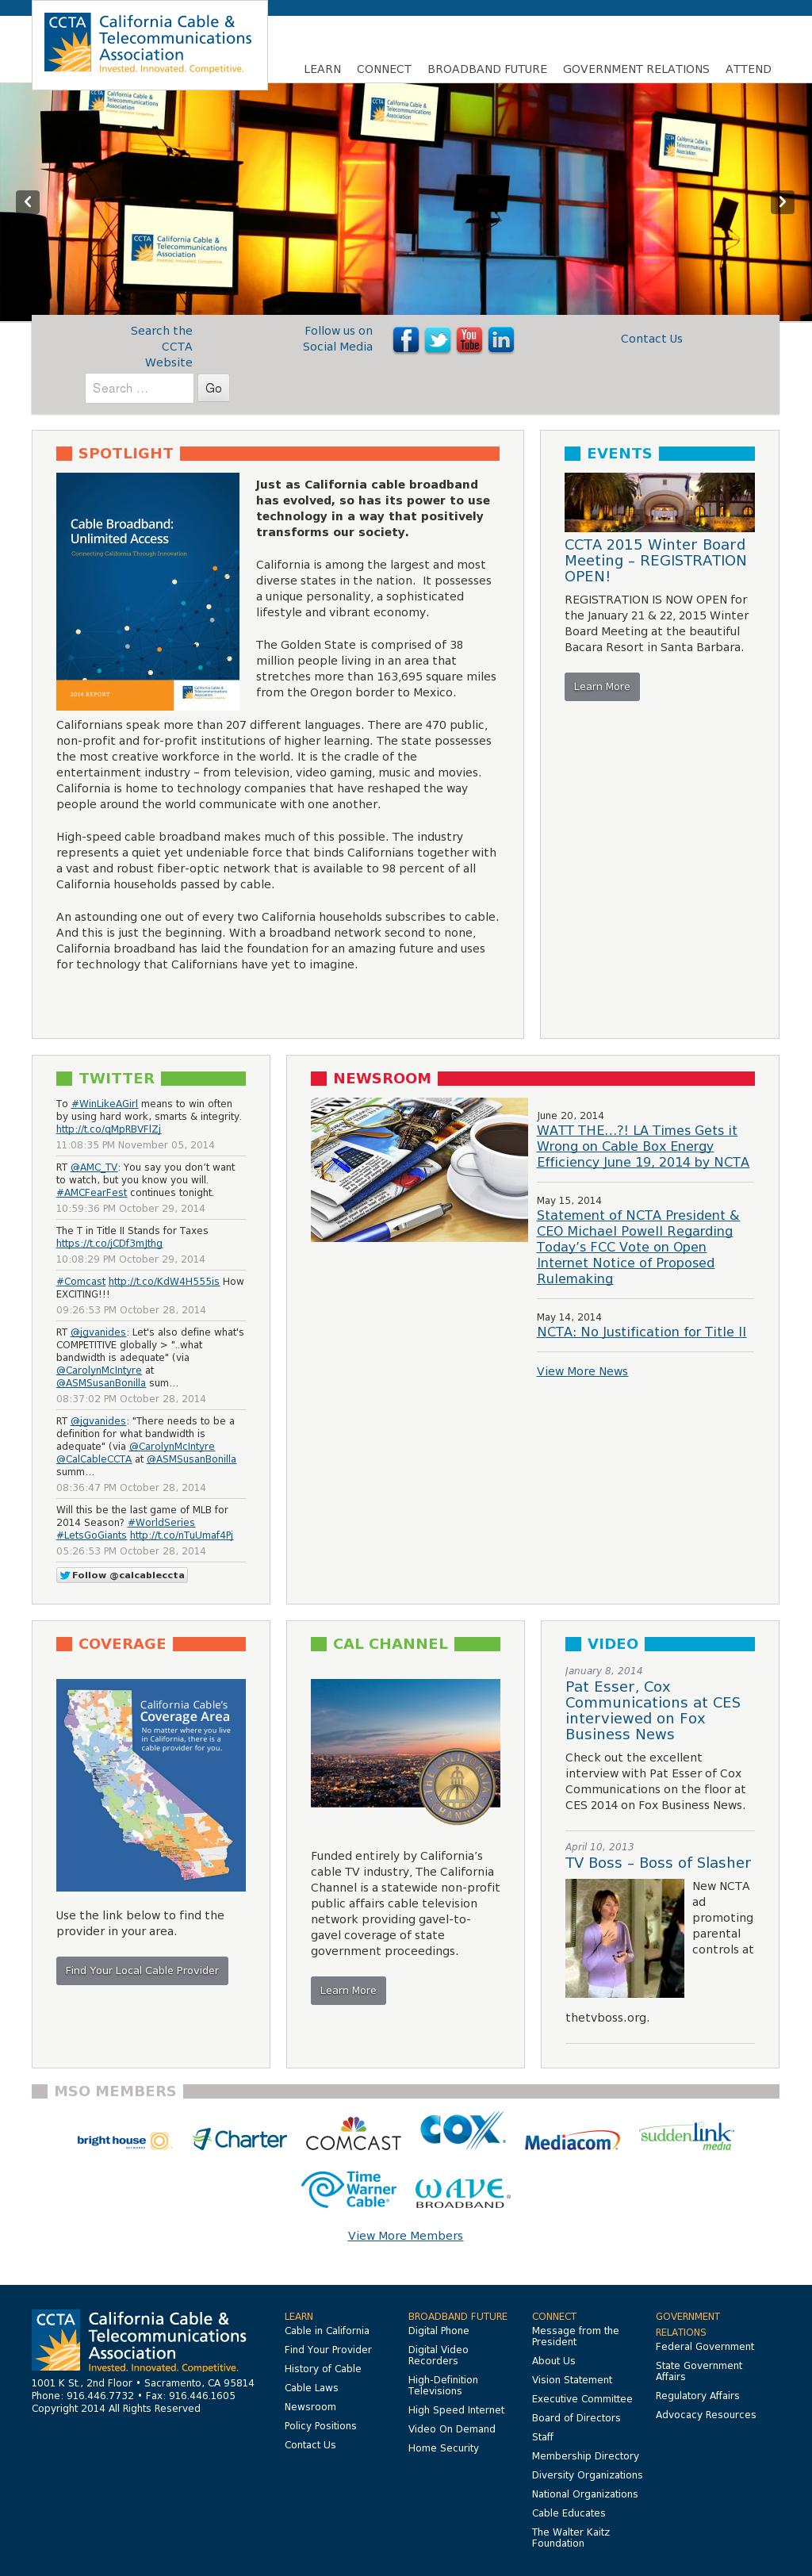 California Cable & Telecommunications Association Competitors